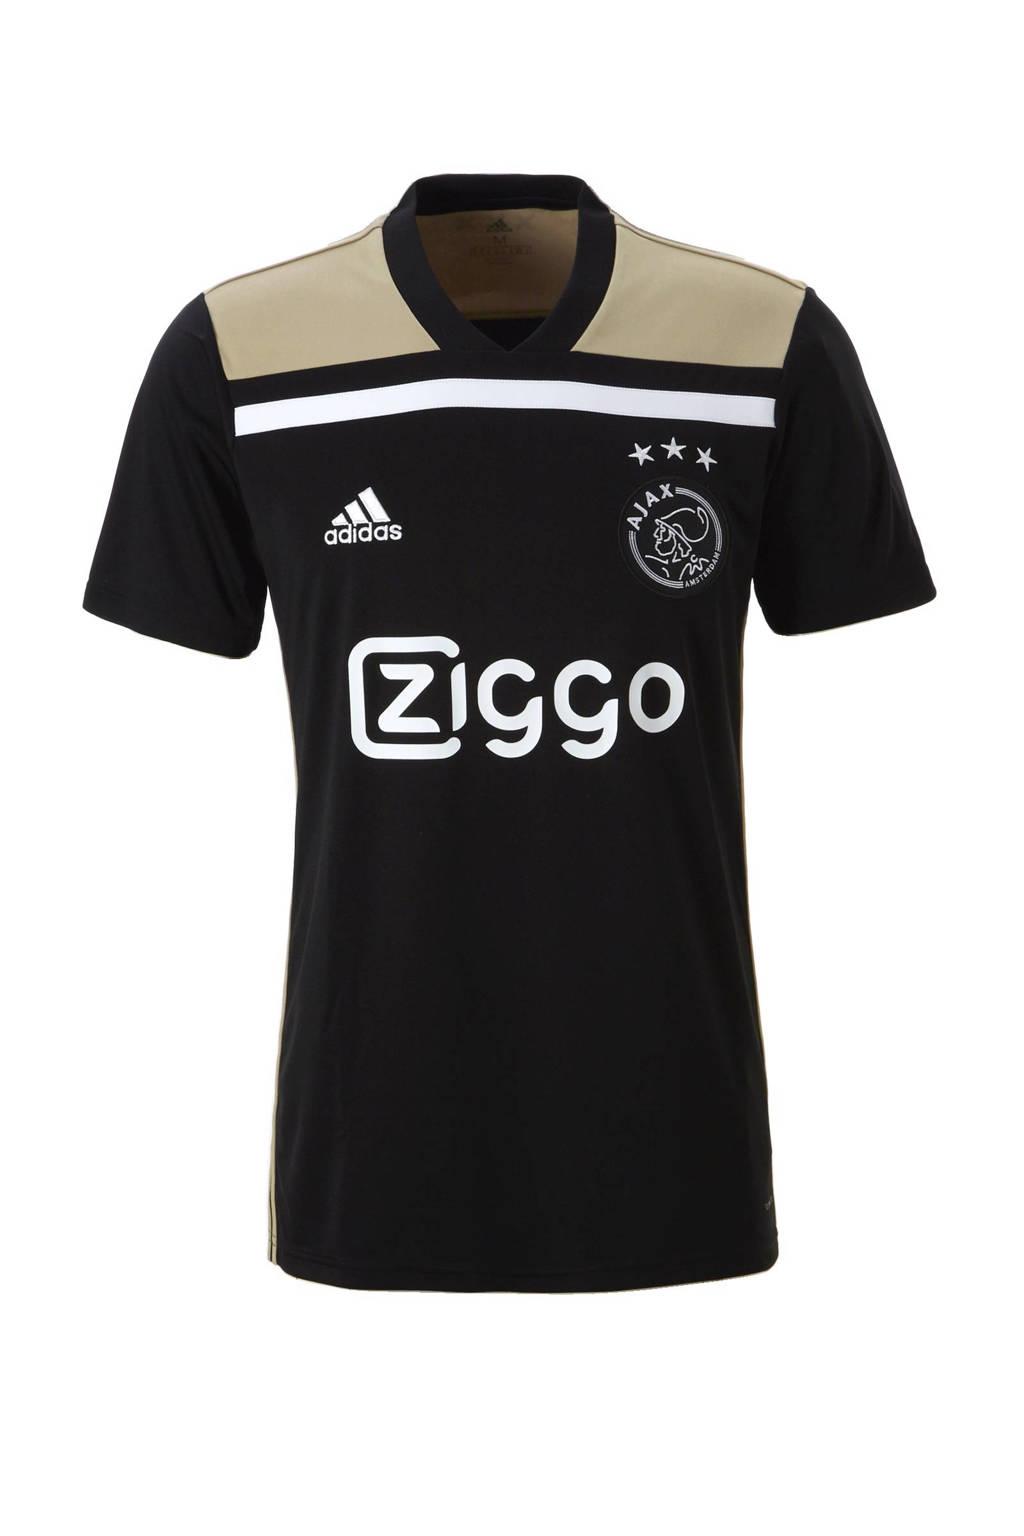 adidas Performance Senior Ajax uit voetbalshirt, Zwart/ wit/ zand